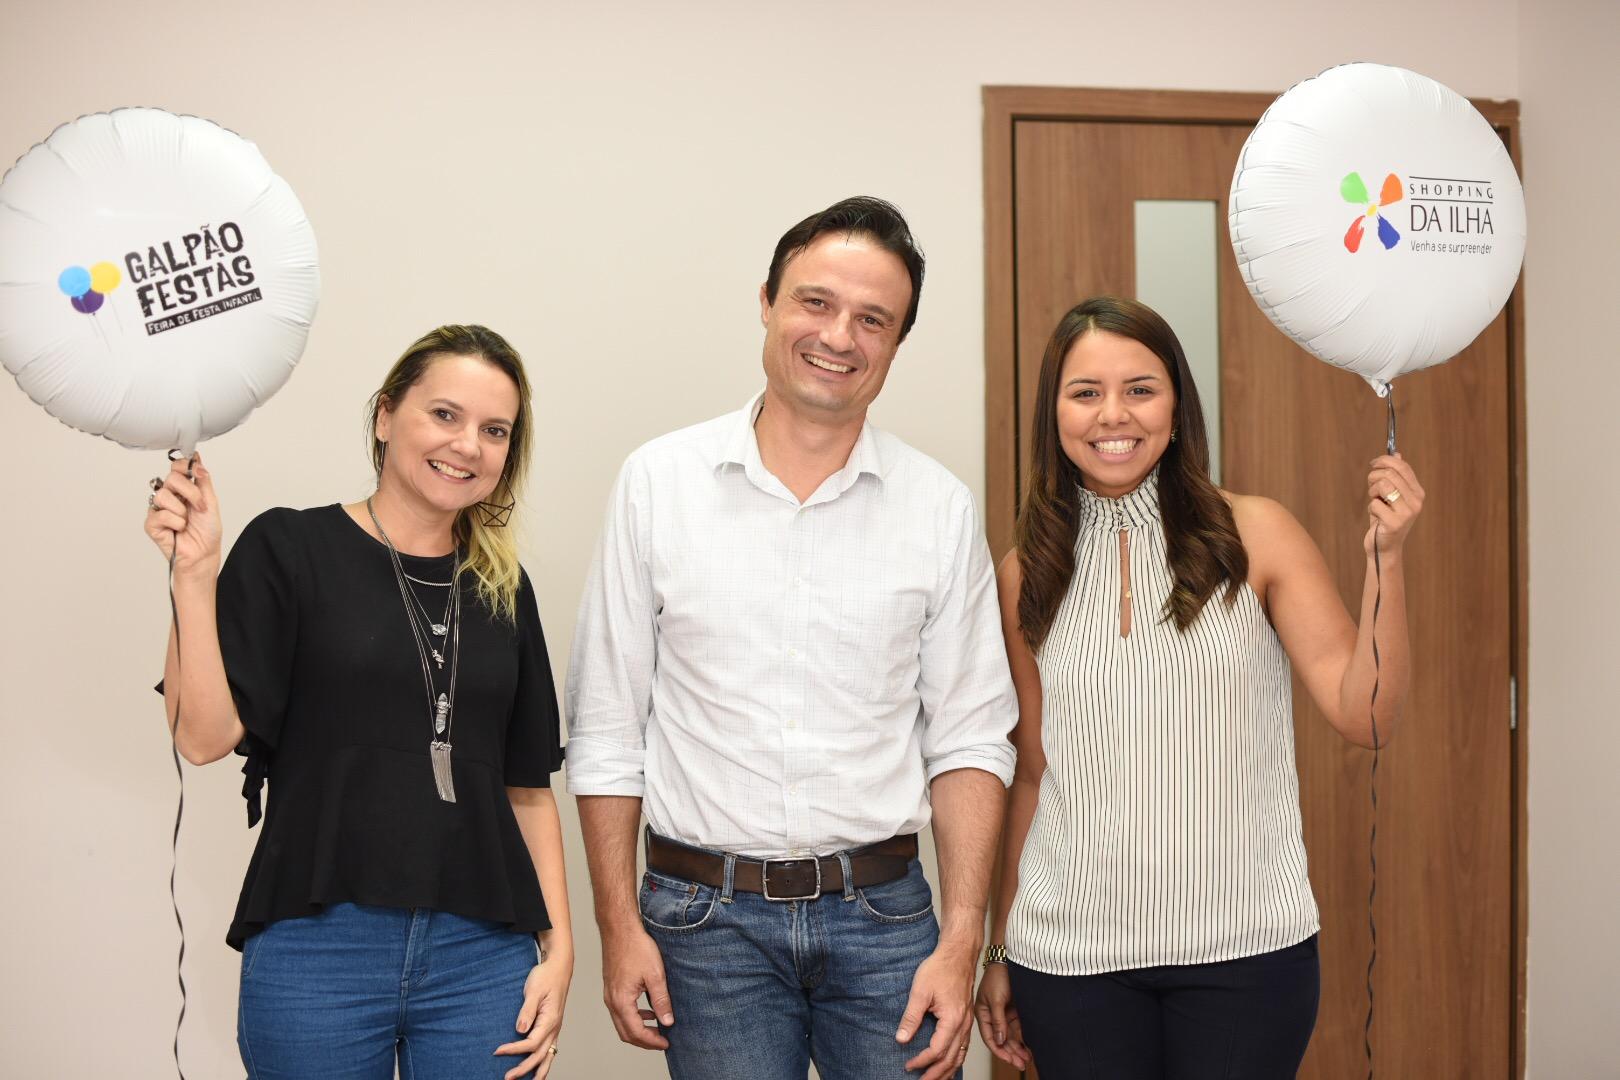 Livia Martins, Jose Roberto superintendente do Shopping da Ilha e Gabriella Bayma